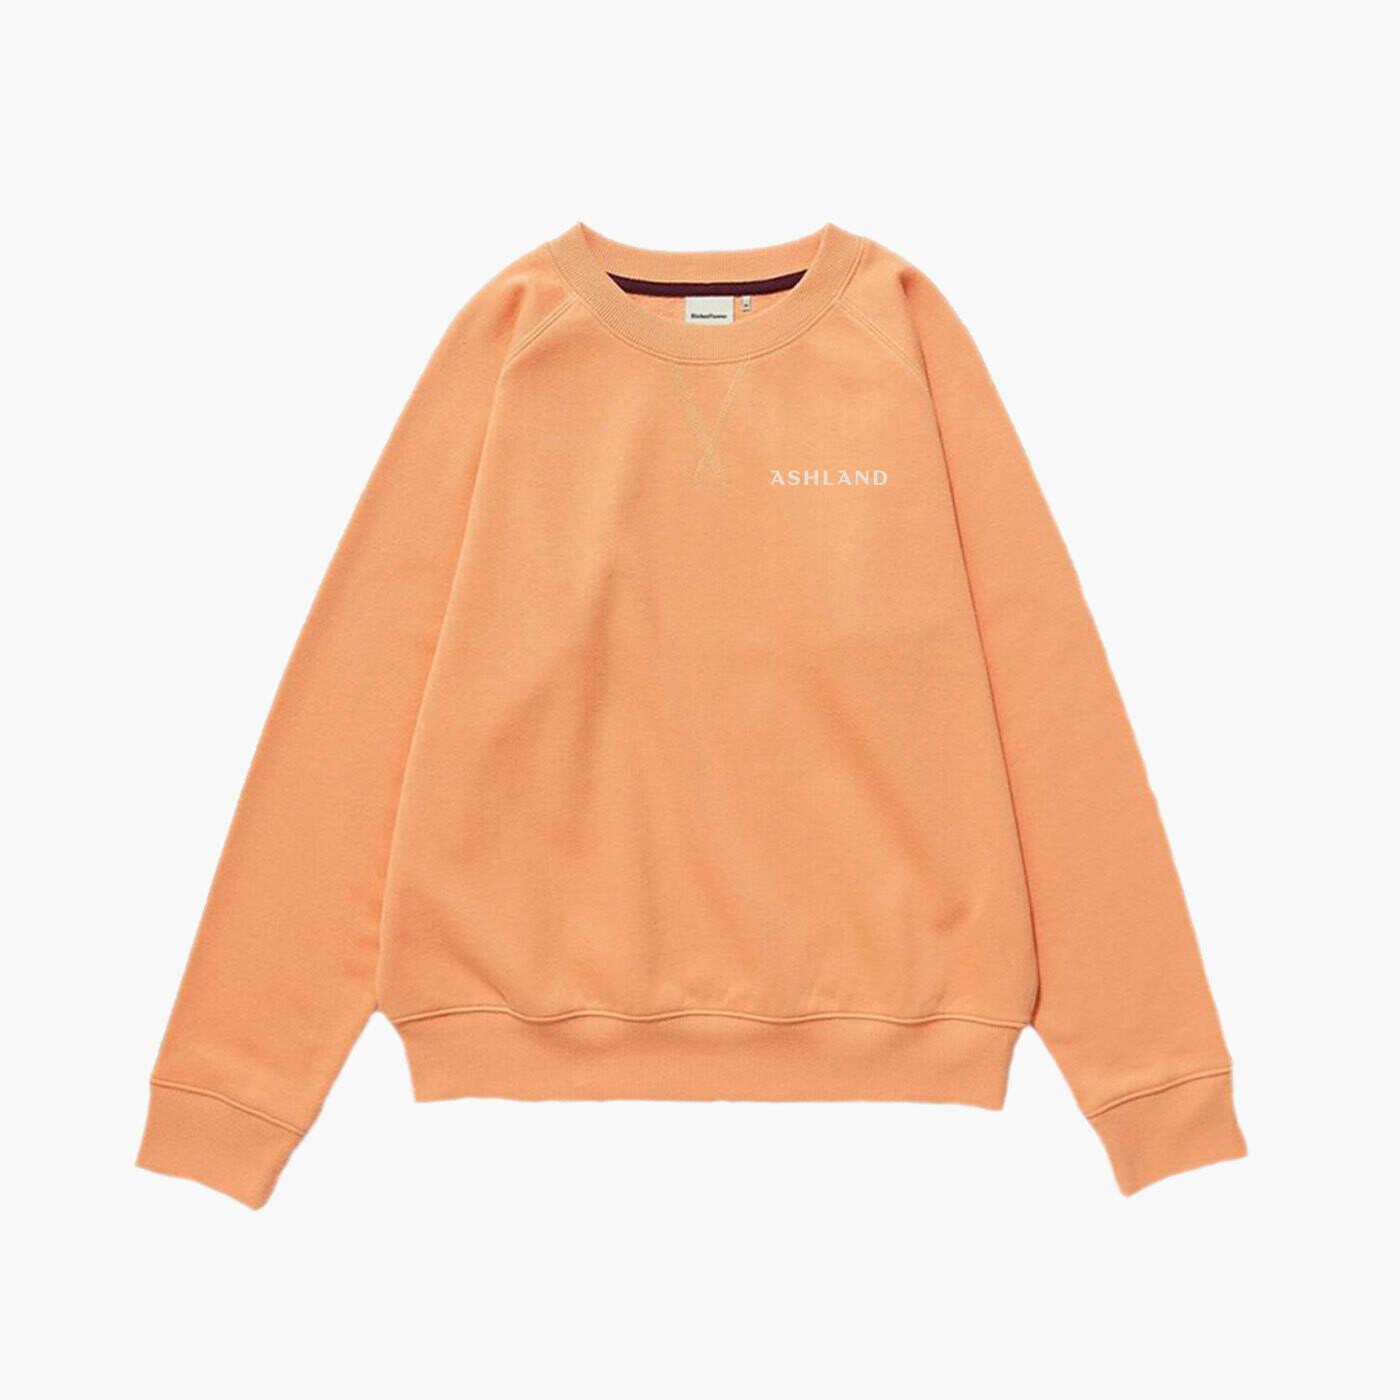 Women's Traditional Crewneck Sweatshirt